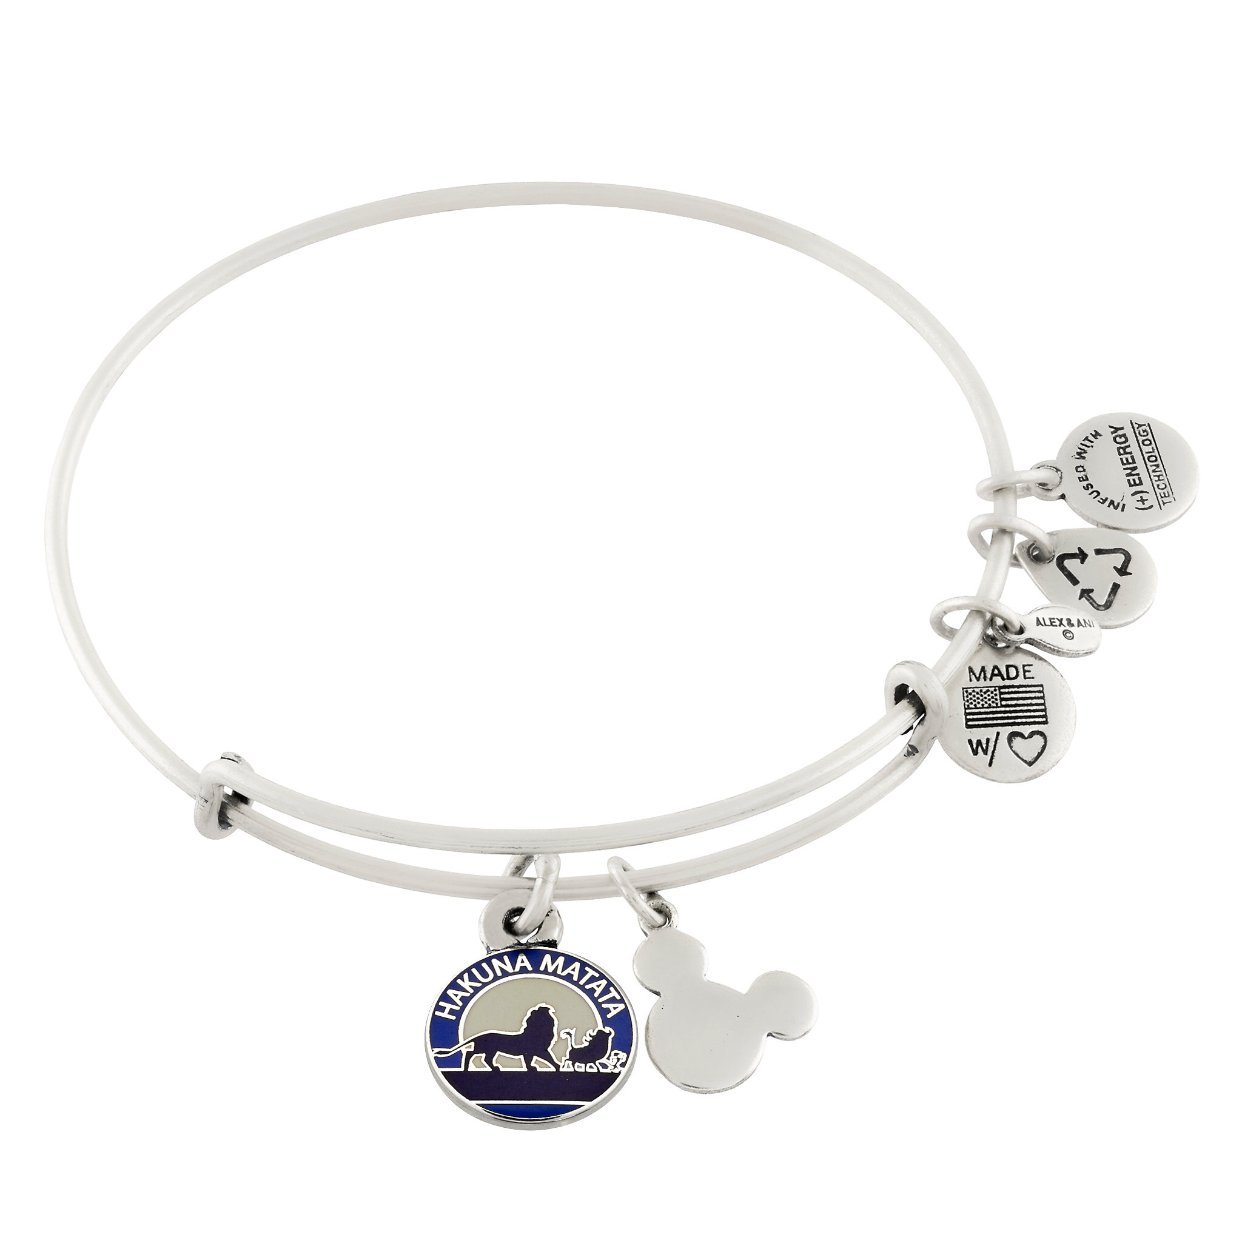 Disney Hakuna Matata Silver Bracelet Image 1